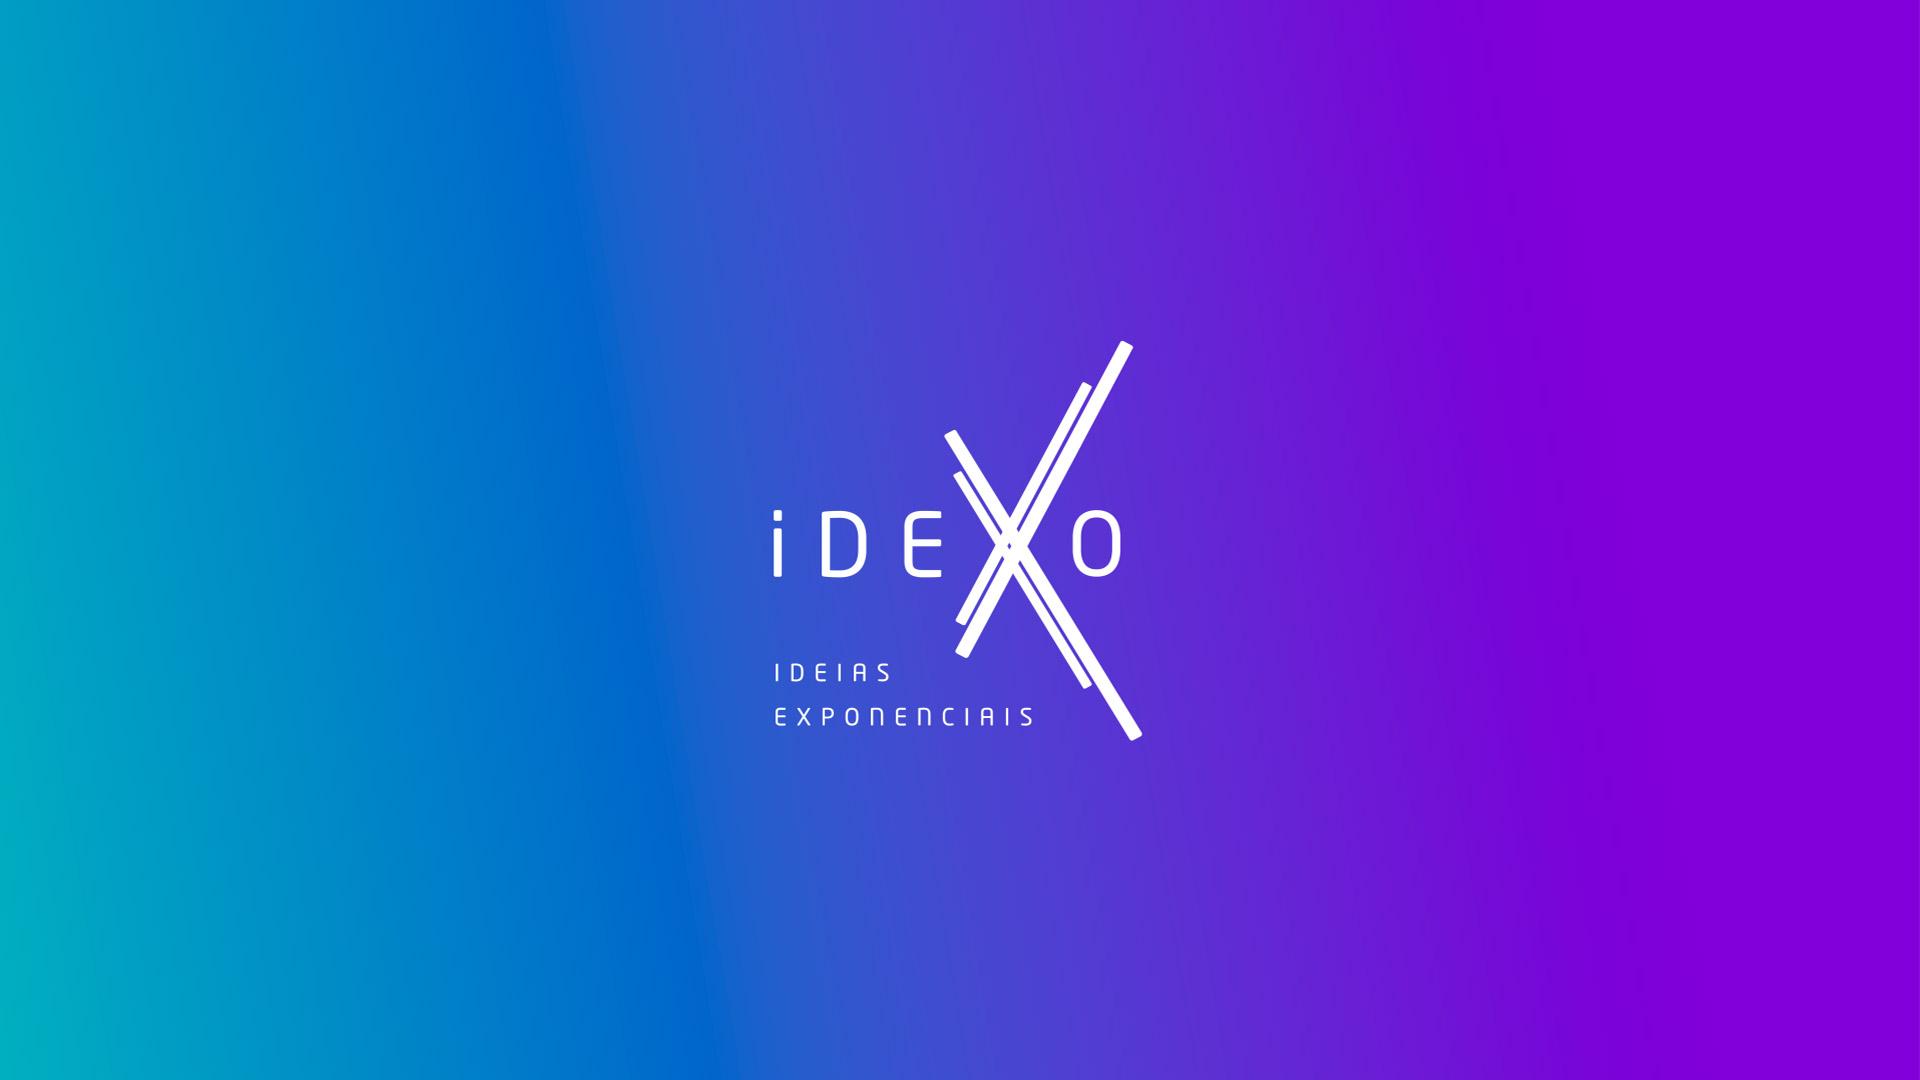 iDEXO unlockers